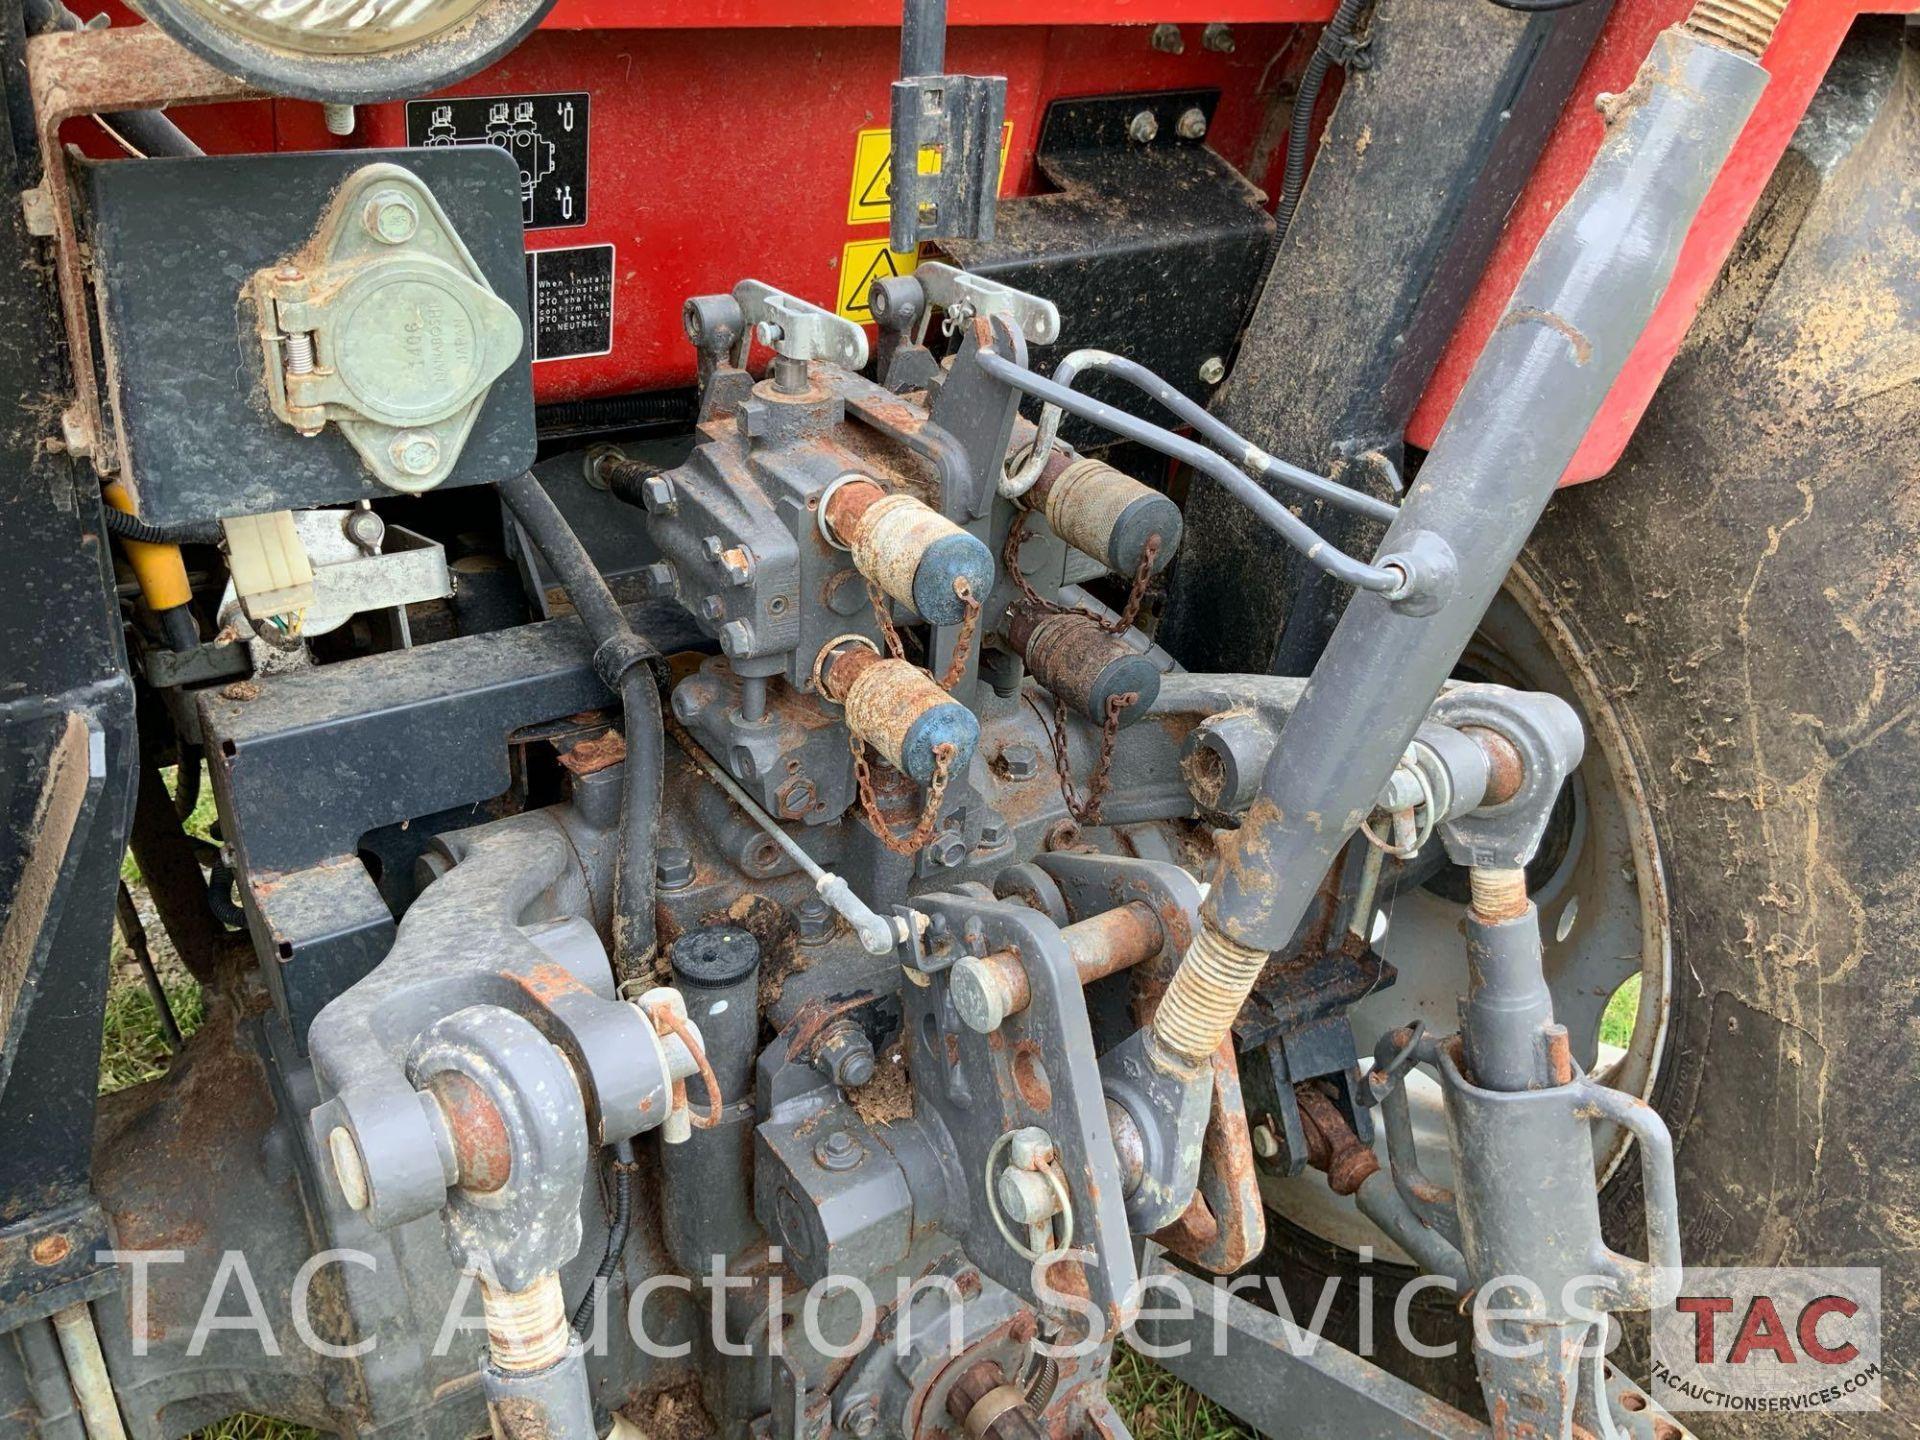 Massey-Ferguson 4610LP Farm Tractor - Image 21 of 26